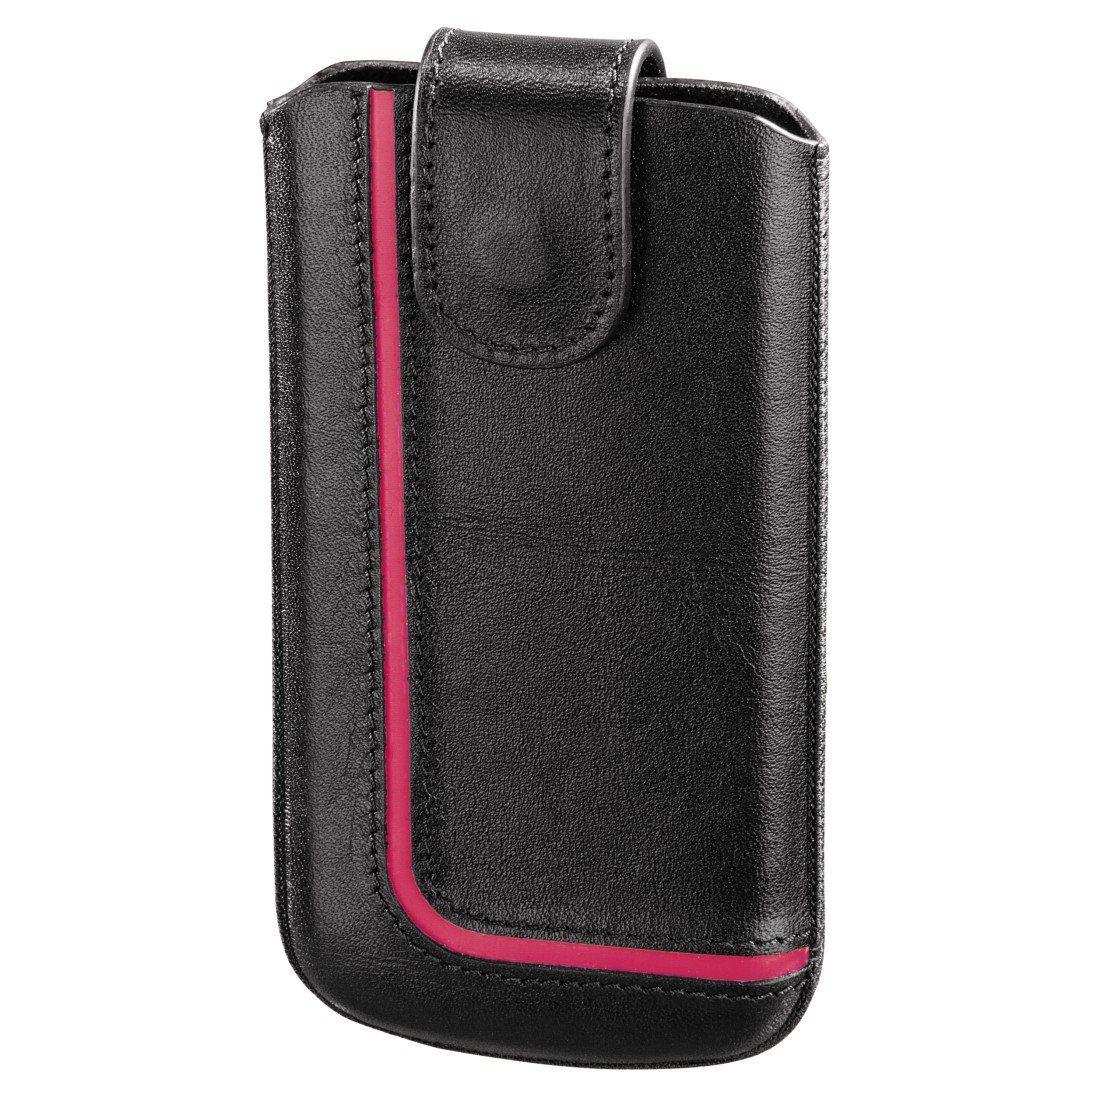 Hama Handy-Sleeve Neon Black, Gr. M, Schwarz/Pink